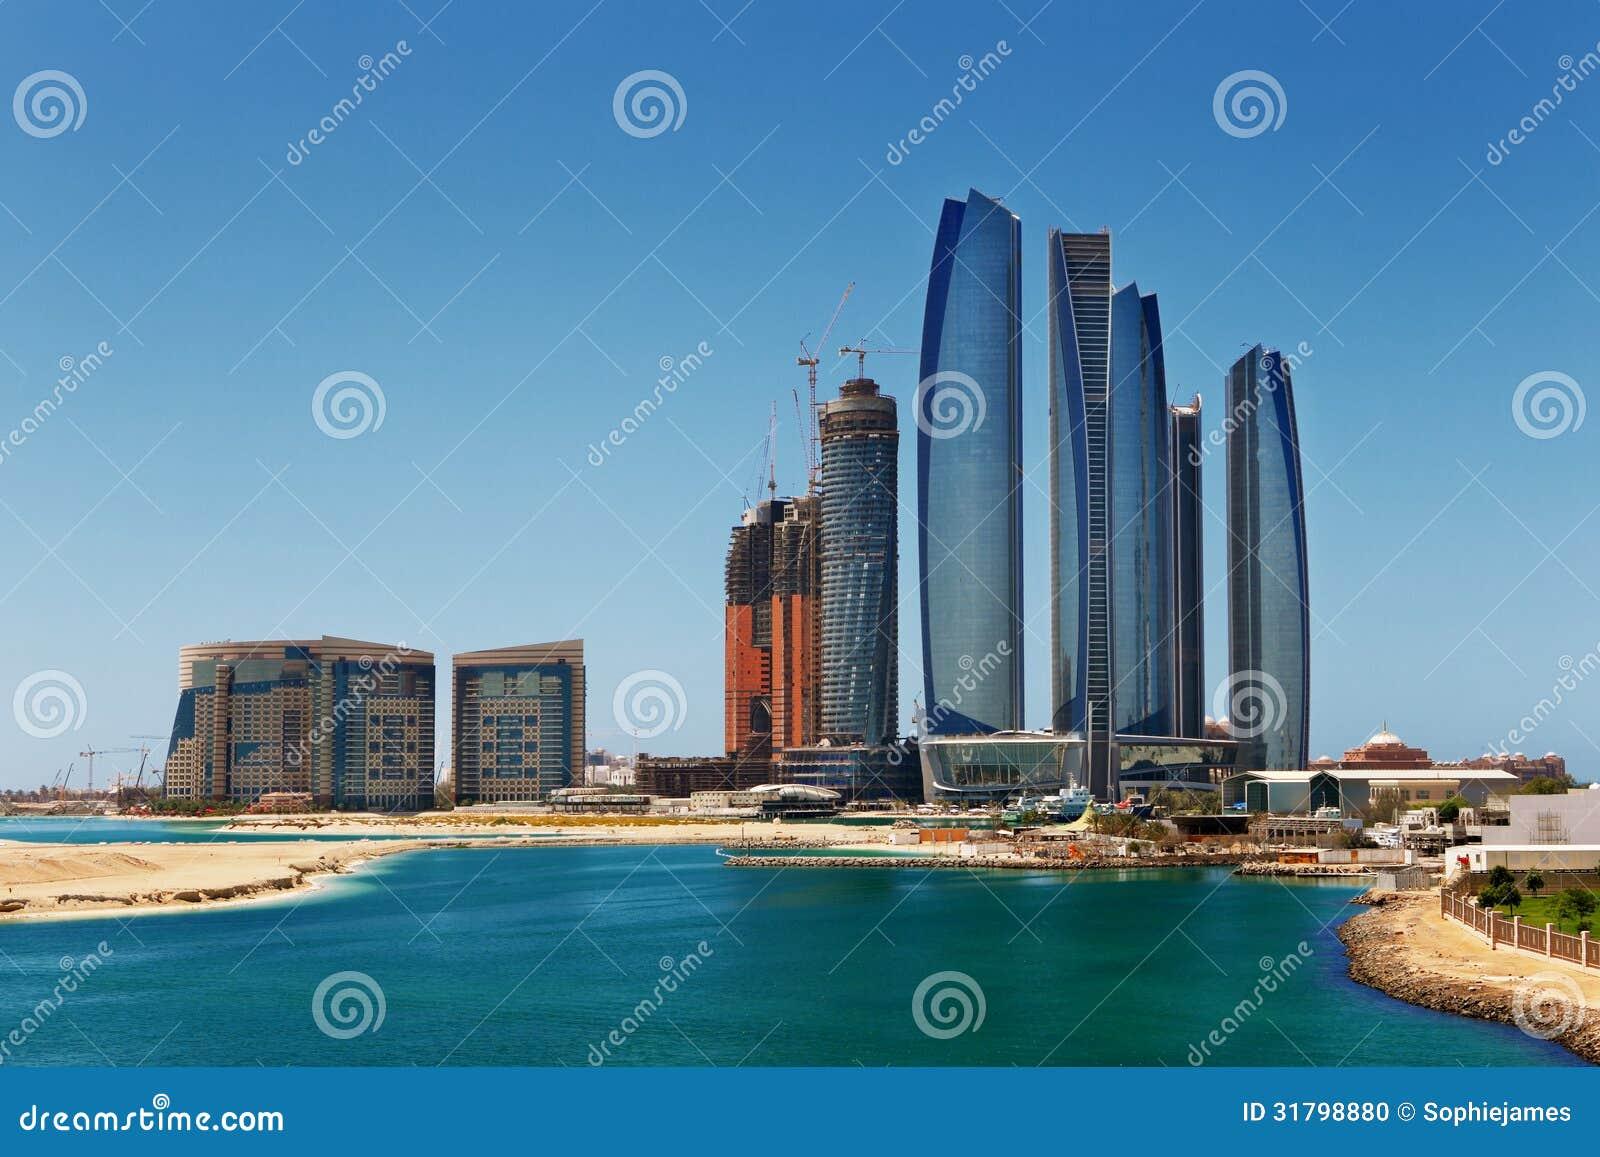 A Skyline View Of Abu Dhabi, UAE's Capital City Stock Photo